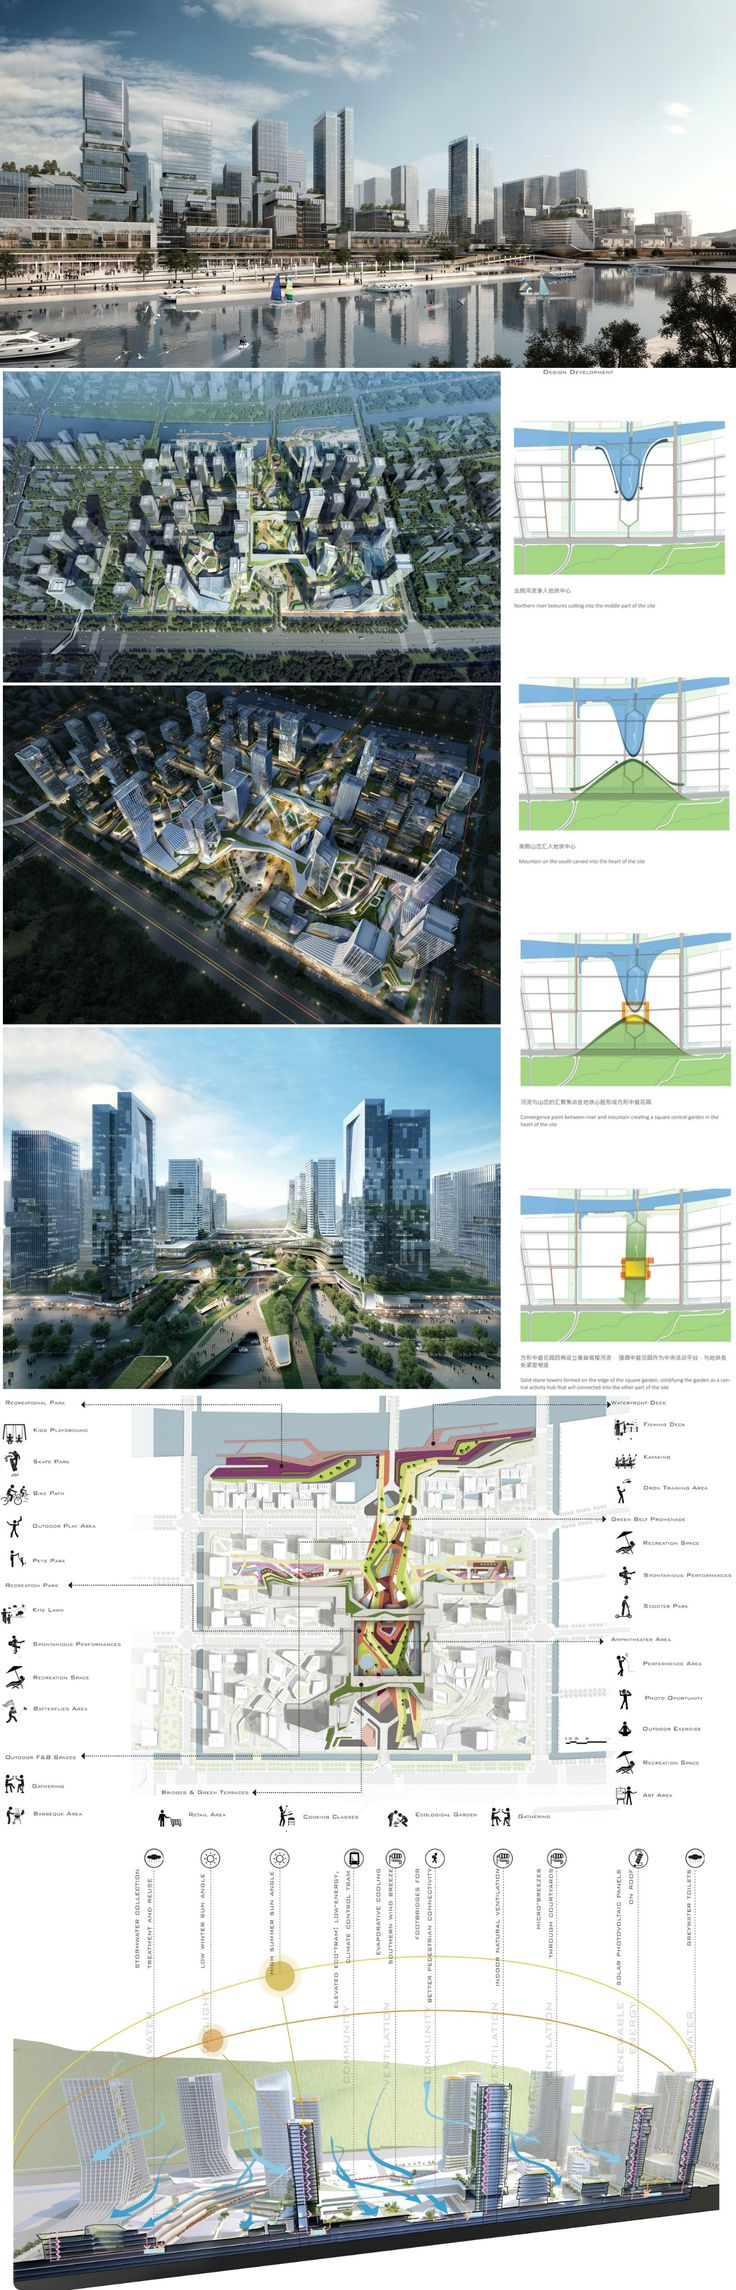 10 DESIGN/ Competition / Urban Development in Zhuhai